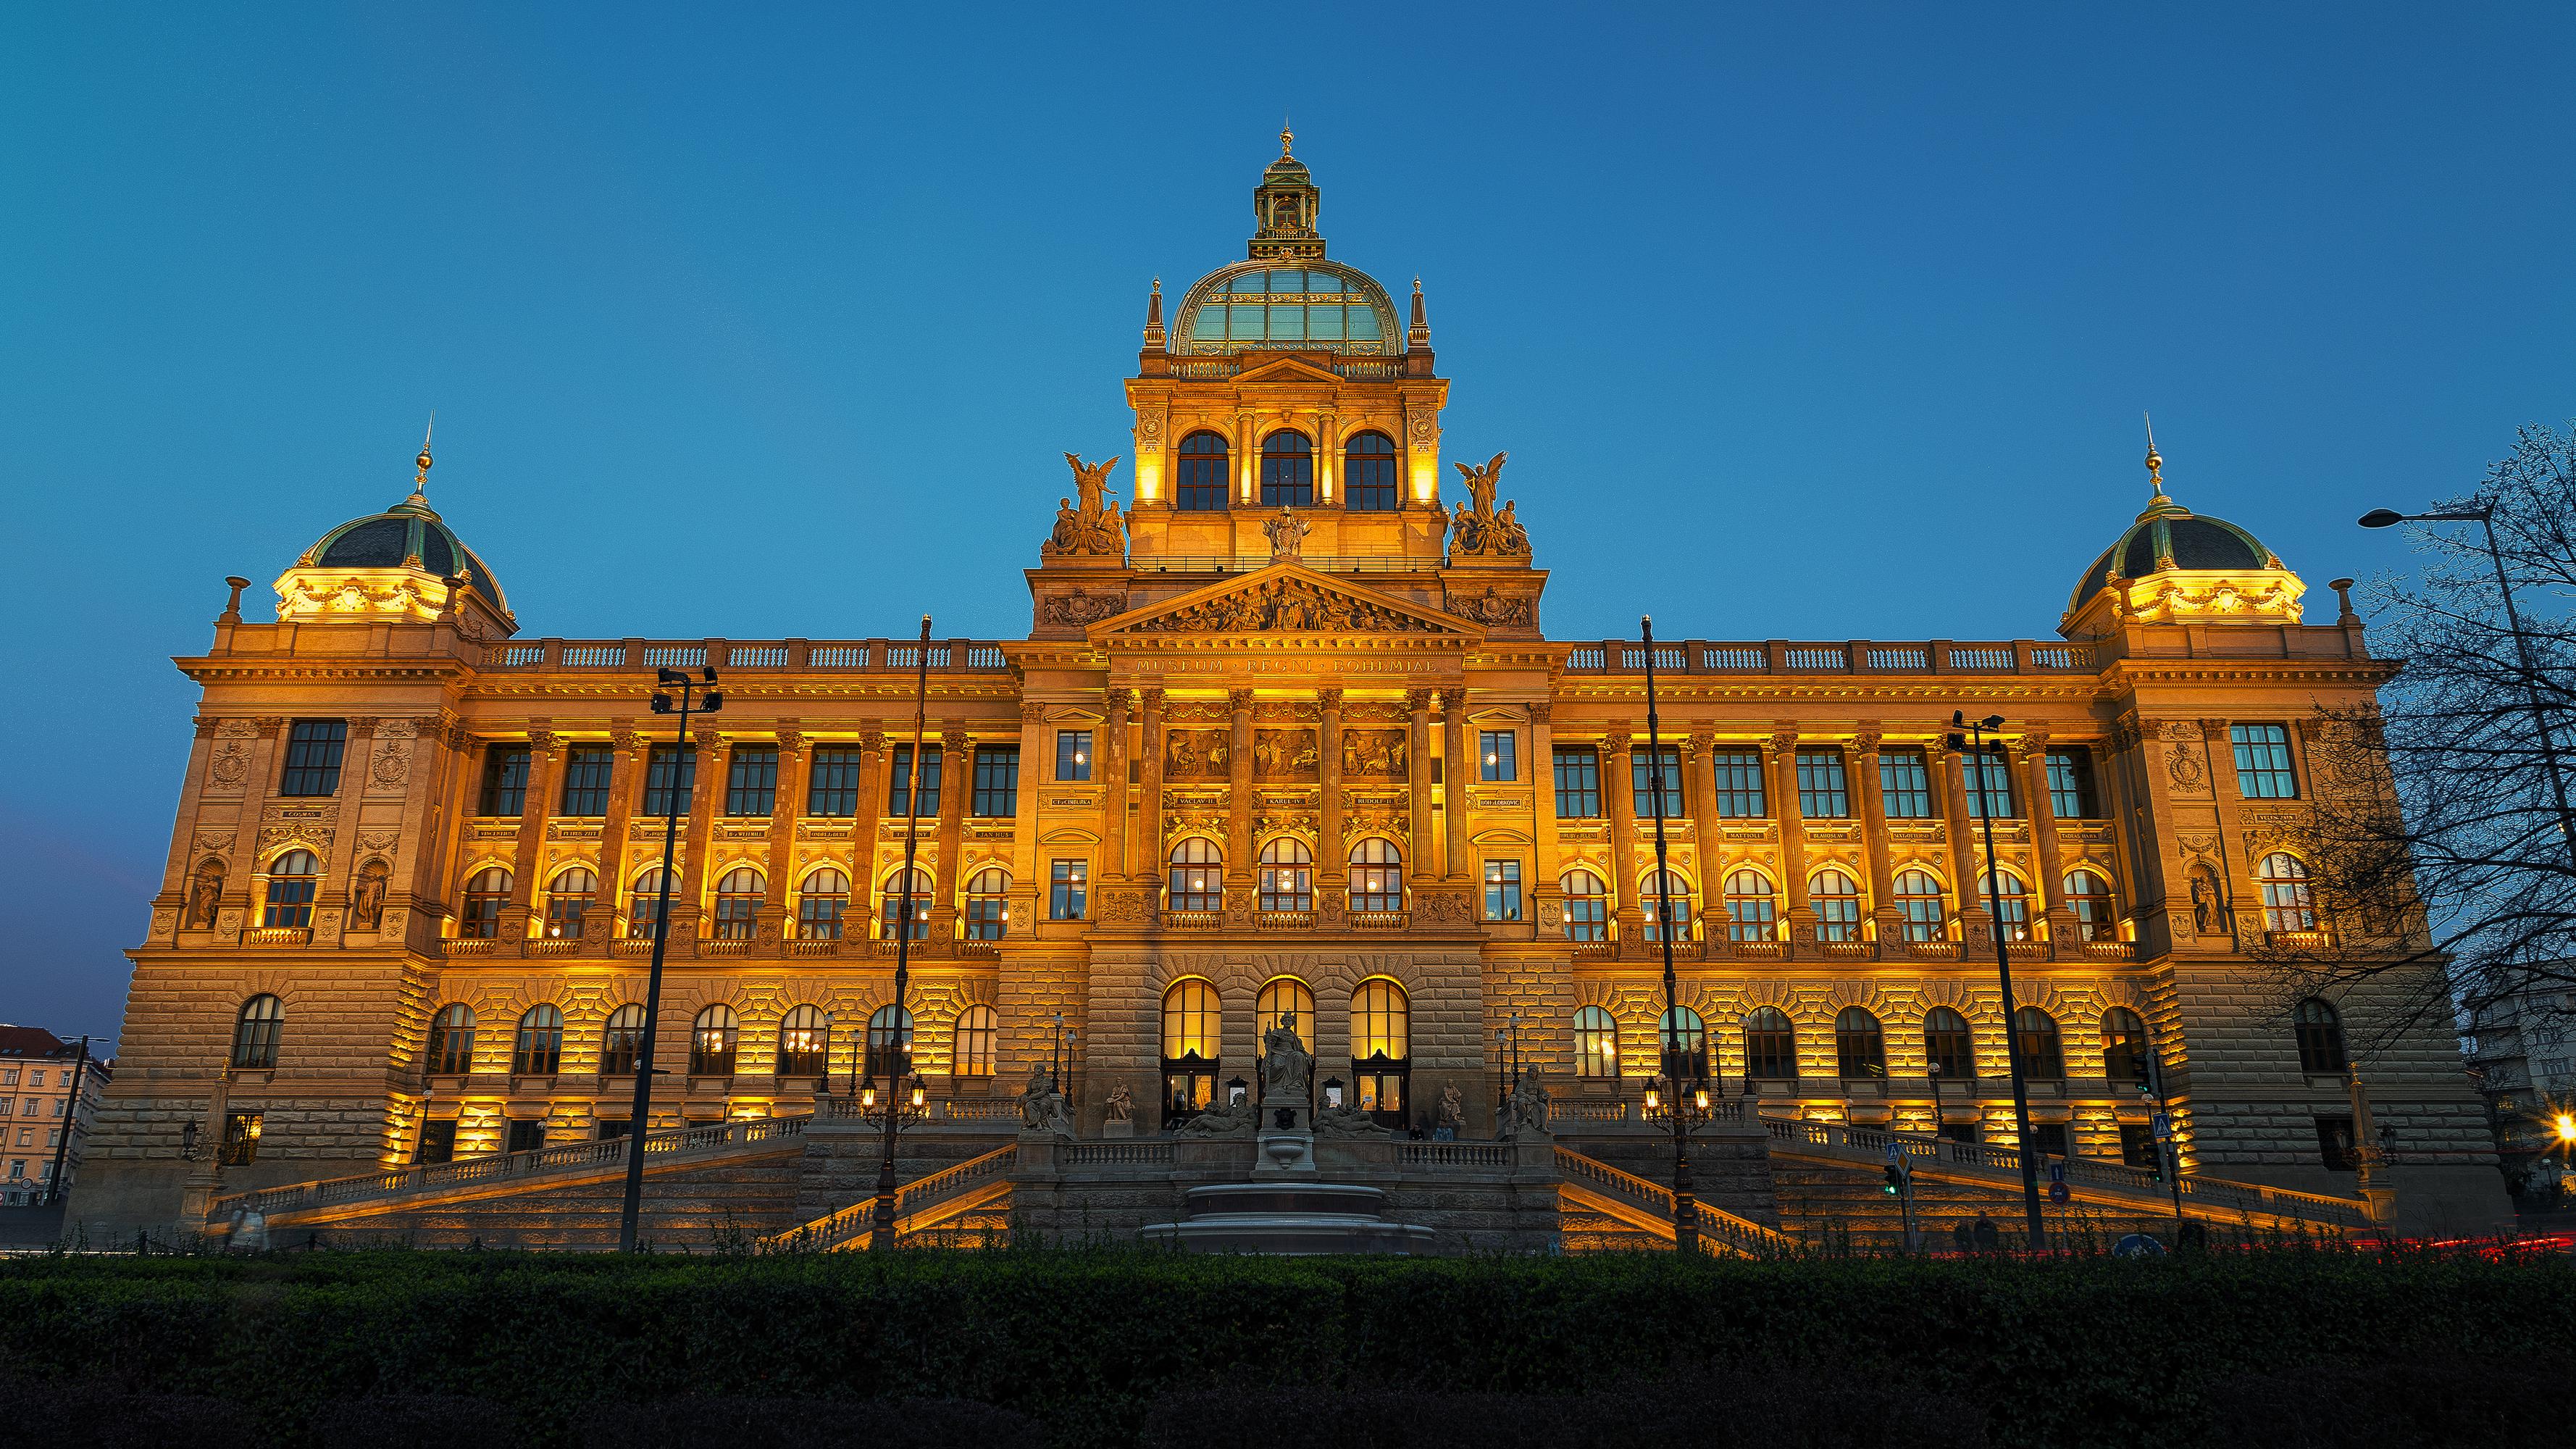 Фотография Прага Чехия музеи National Museum Лестница Вечер Уличные фонари Дома Города 3556x2000 Музей лестницы город Здания